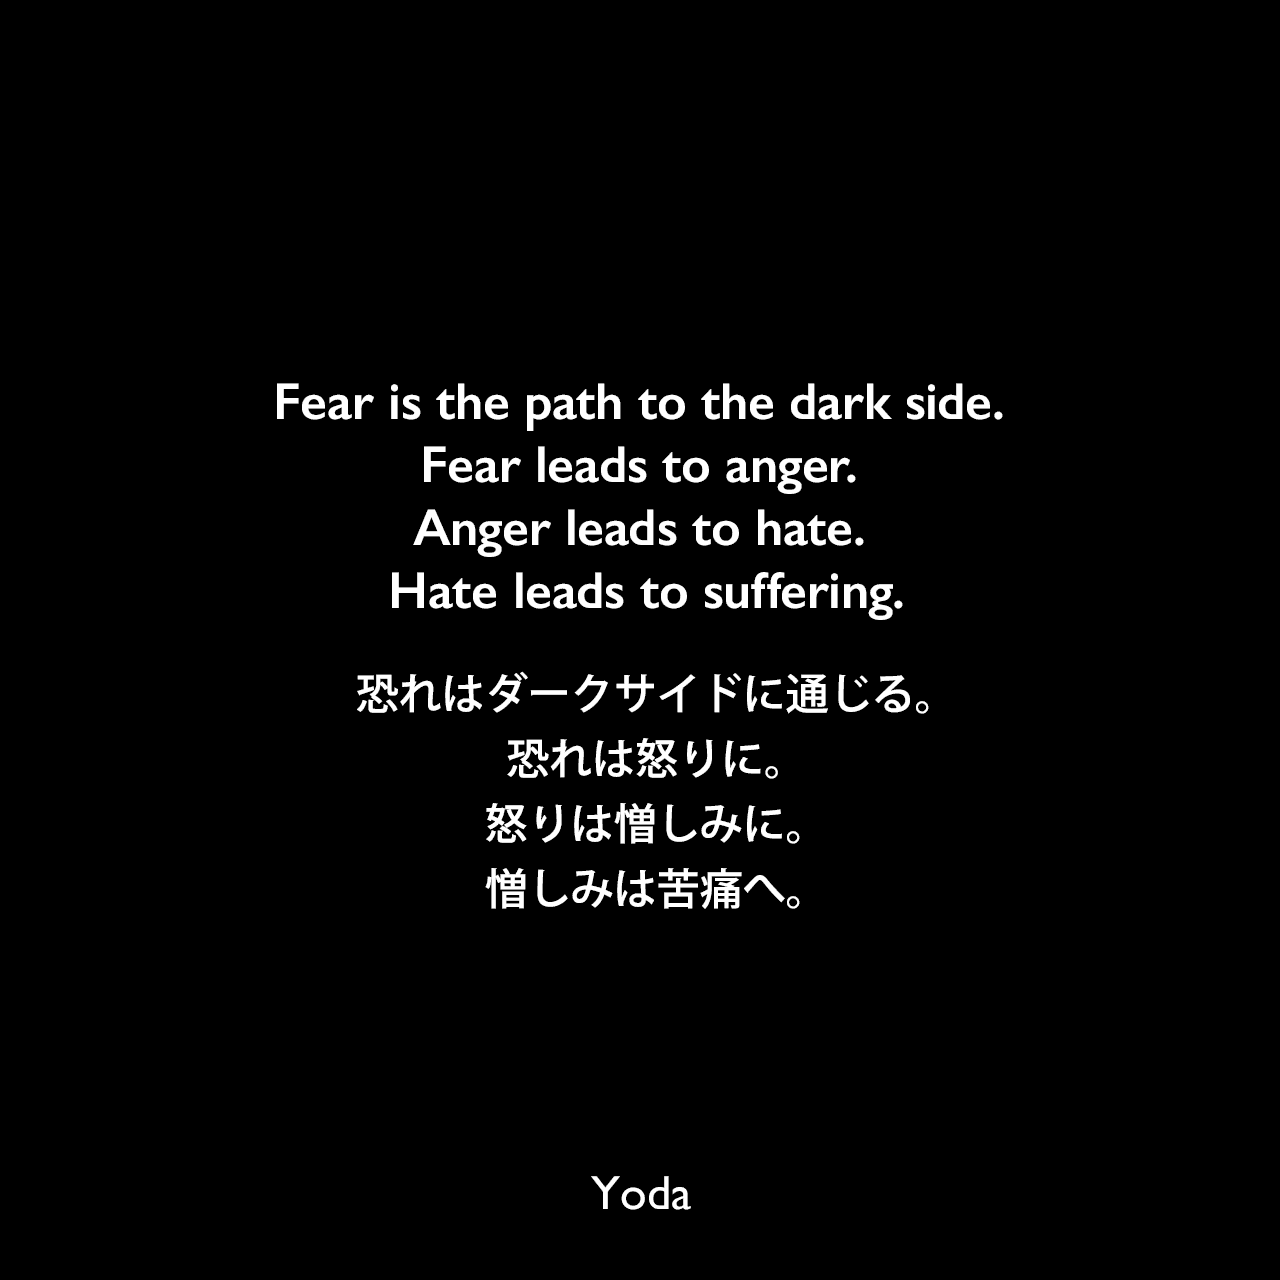 Fear is the path to the dark side. Fear leads to anger. Anger leads to hate. Hate leads to suffering.恐れはダークサイドに通じる。恐れは怒りに。怒りは憎しみに。憎しみは苦痛へ。- スター・ウォーズ エピソード1/ファントム・メナスYoda